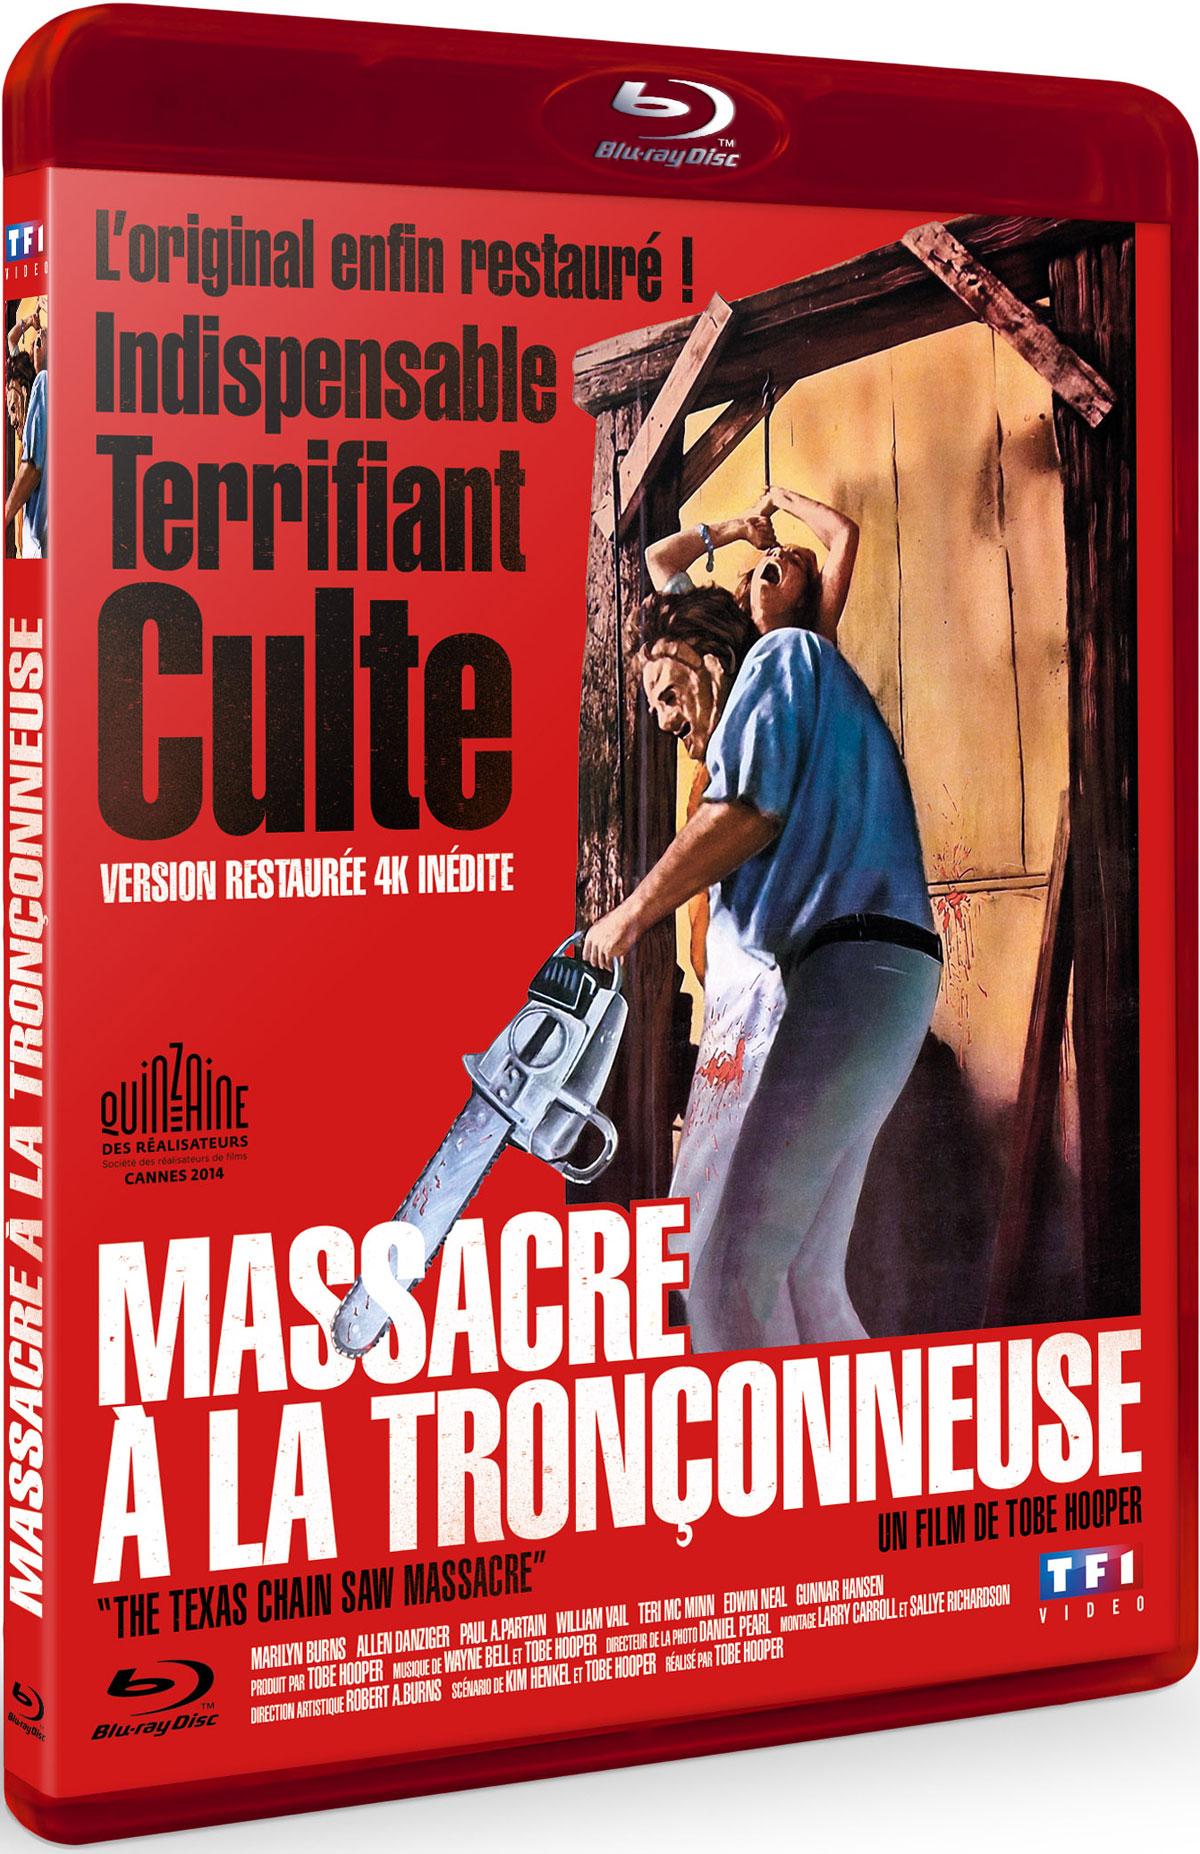 Packshot-Blu-ray-Massacre-à-la-tronçonneuse